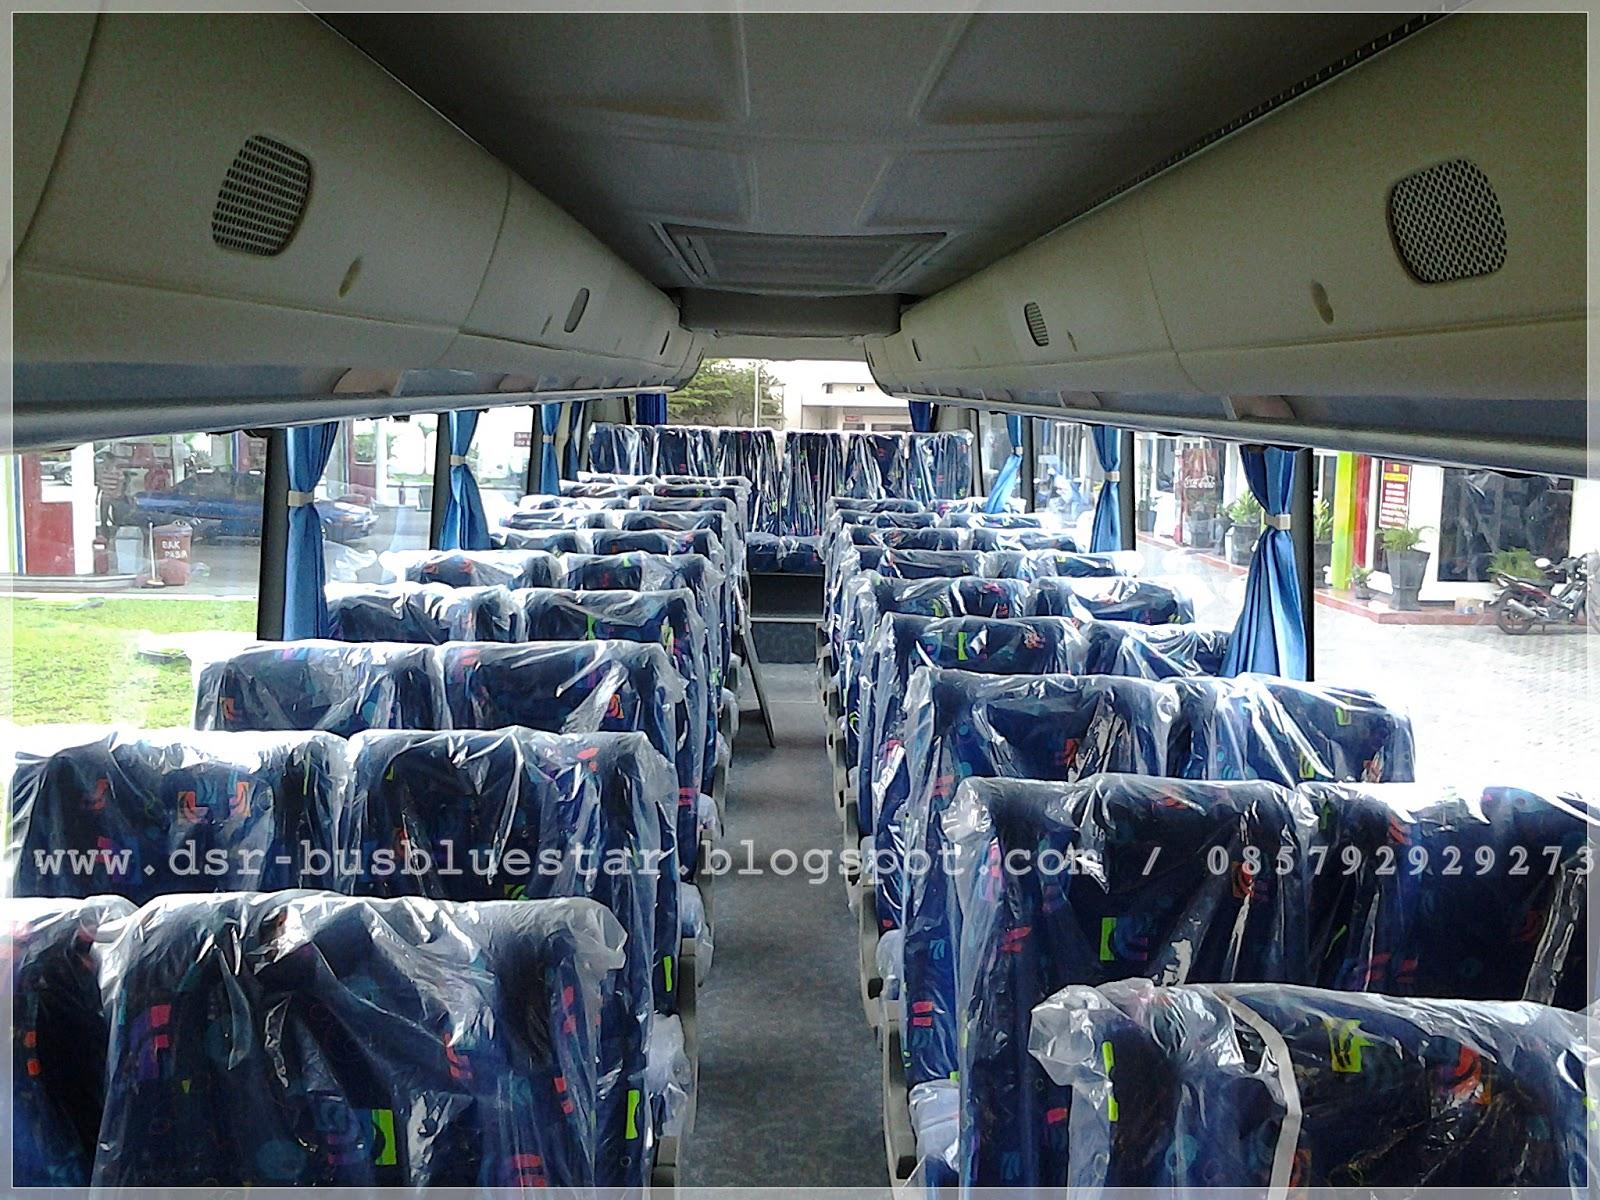 Direct Sales Representative Bus Pariwisata Blue Star : BUS